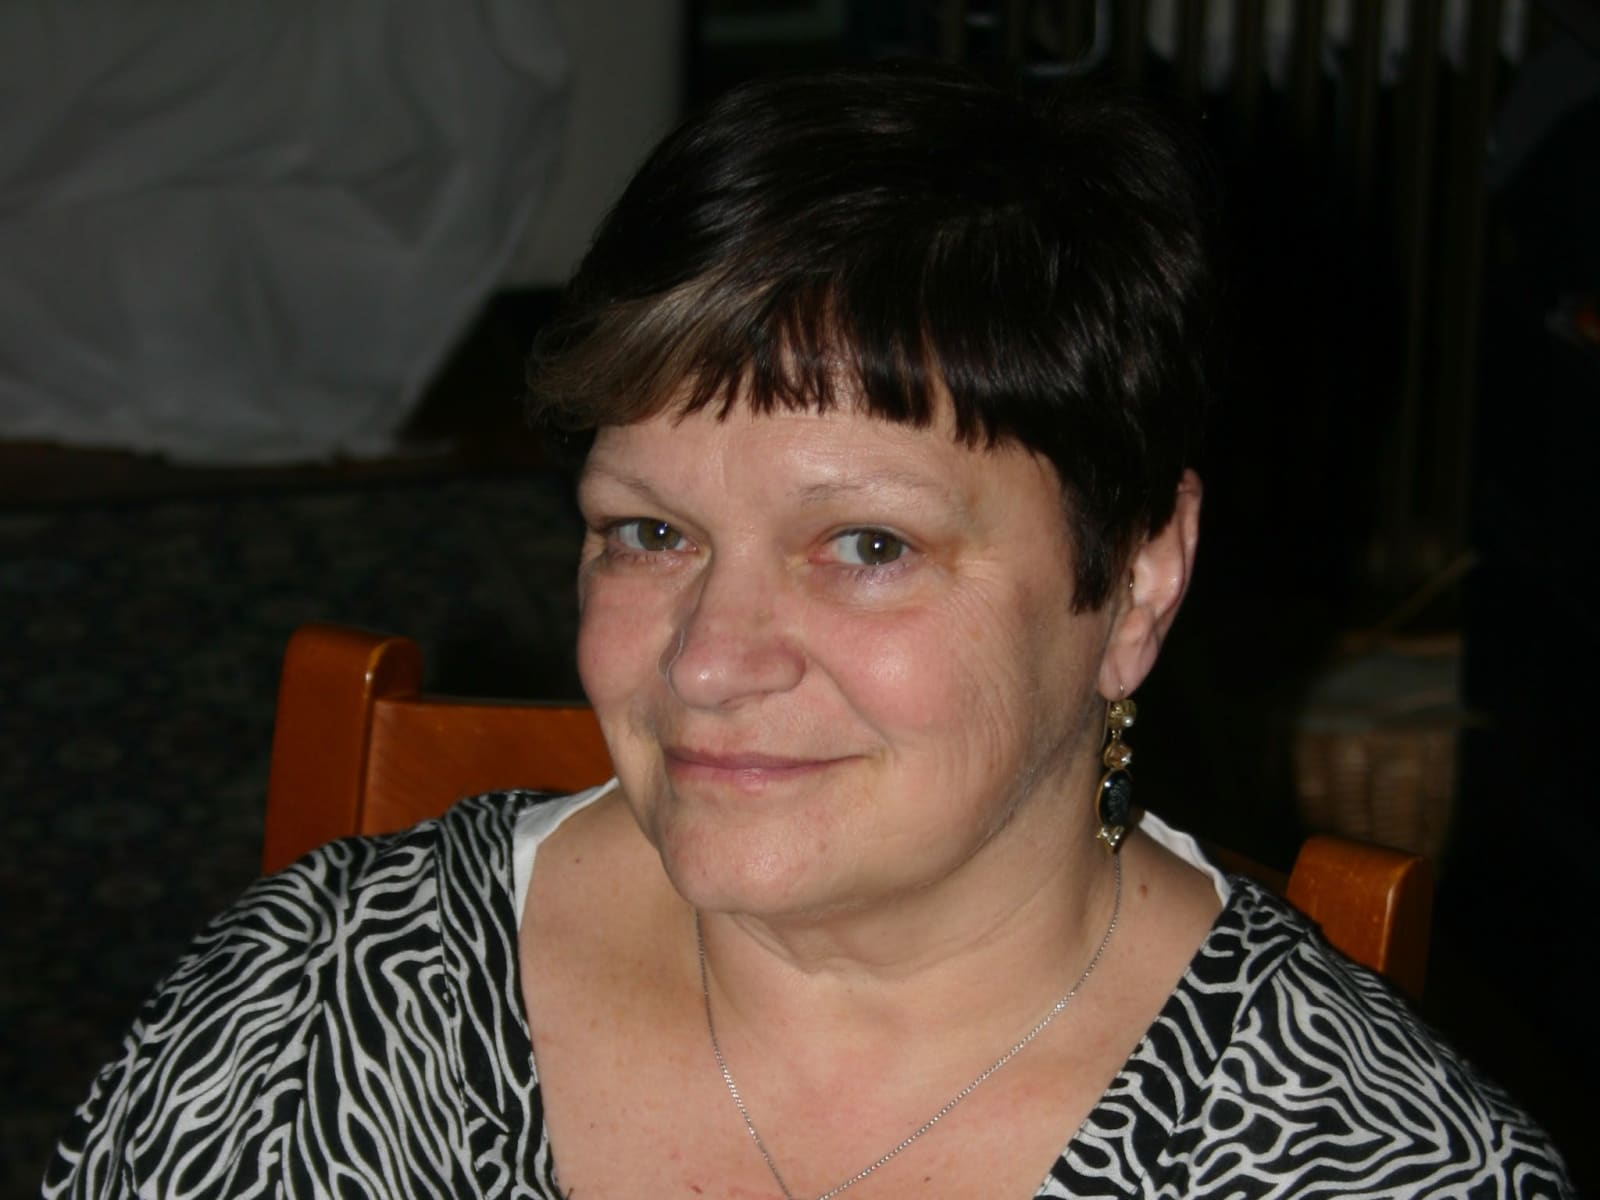 Deborah from Sydney, New South Wales, Australia